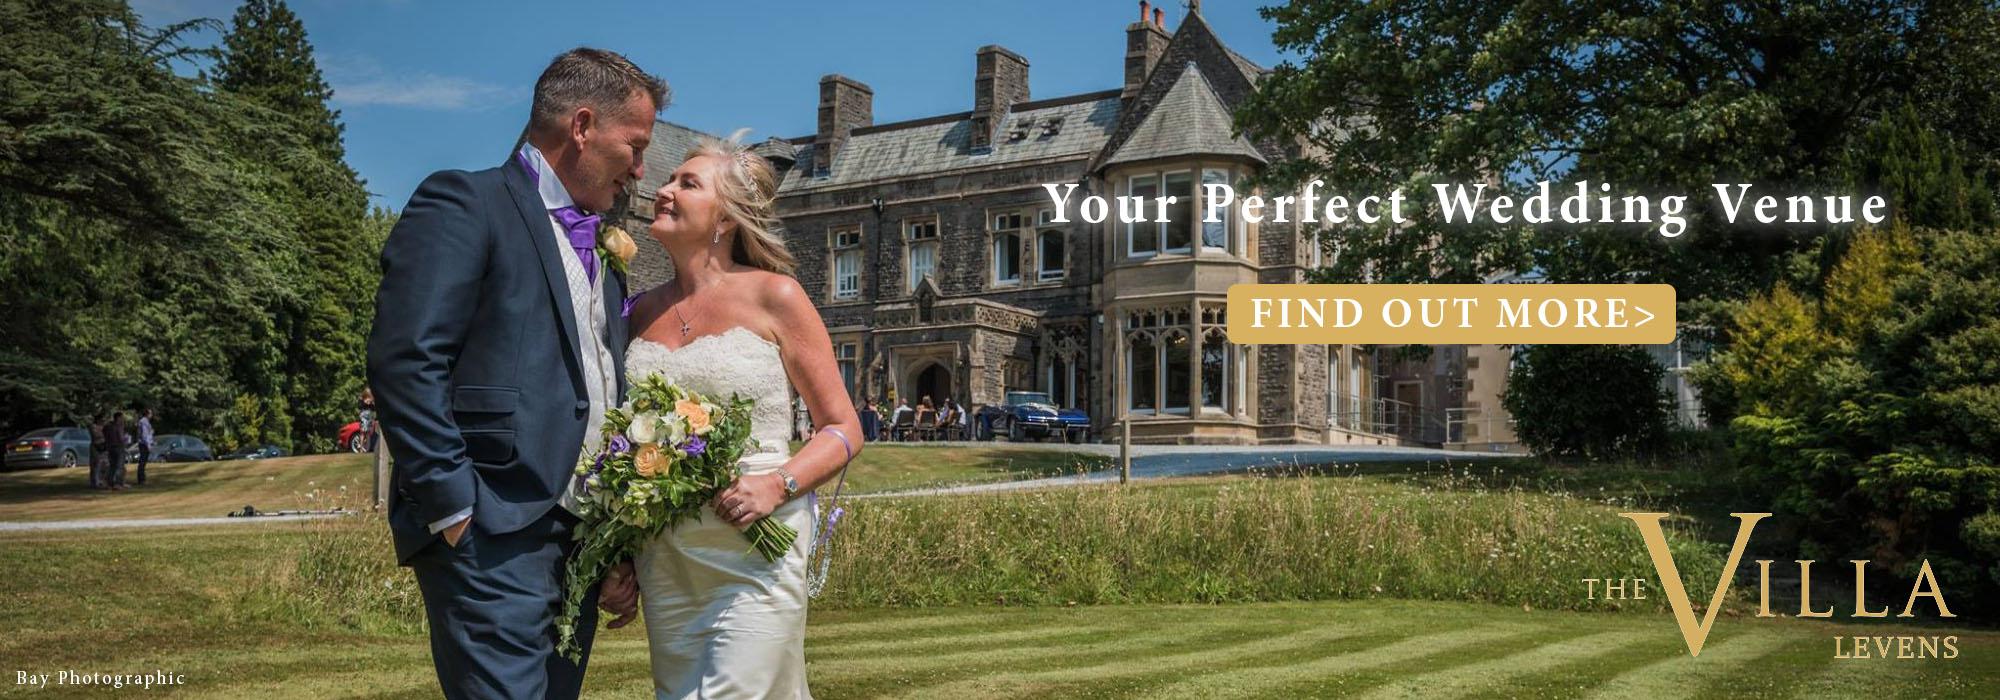 The Villa Levens Wedding Venue South Lakes